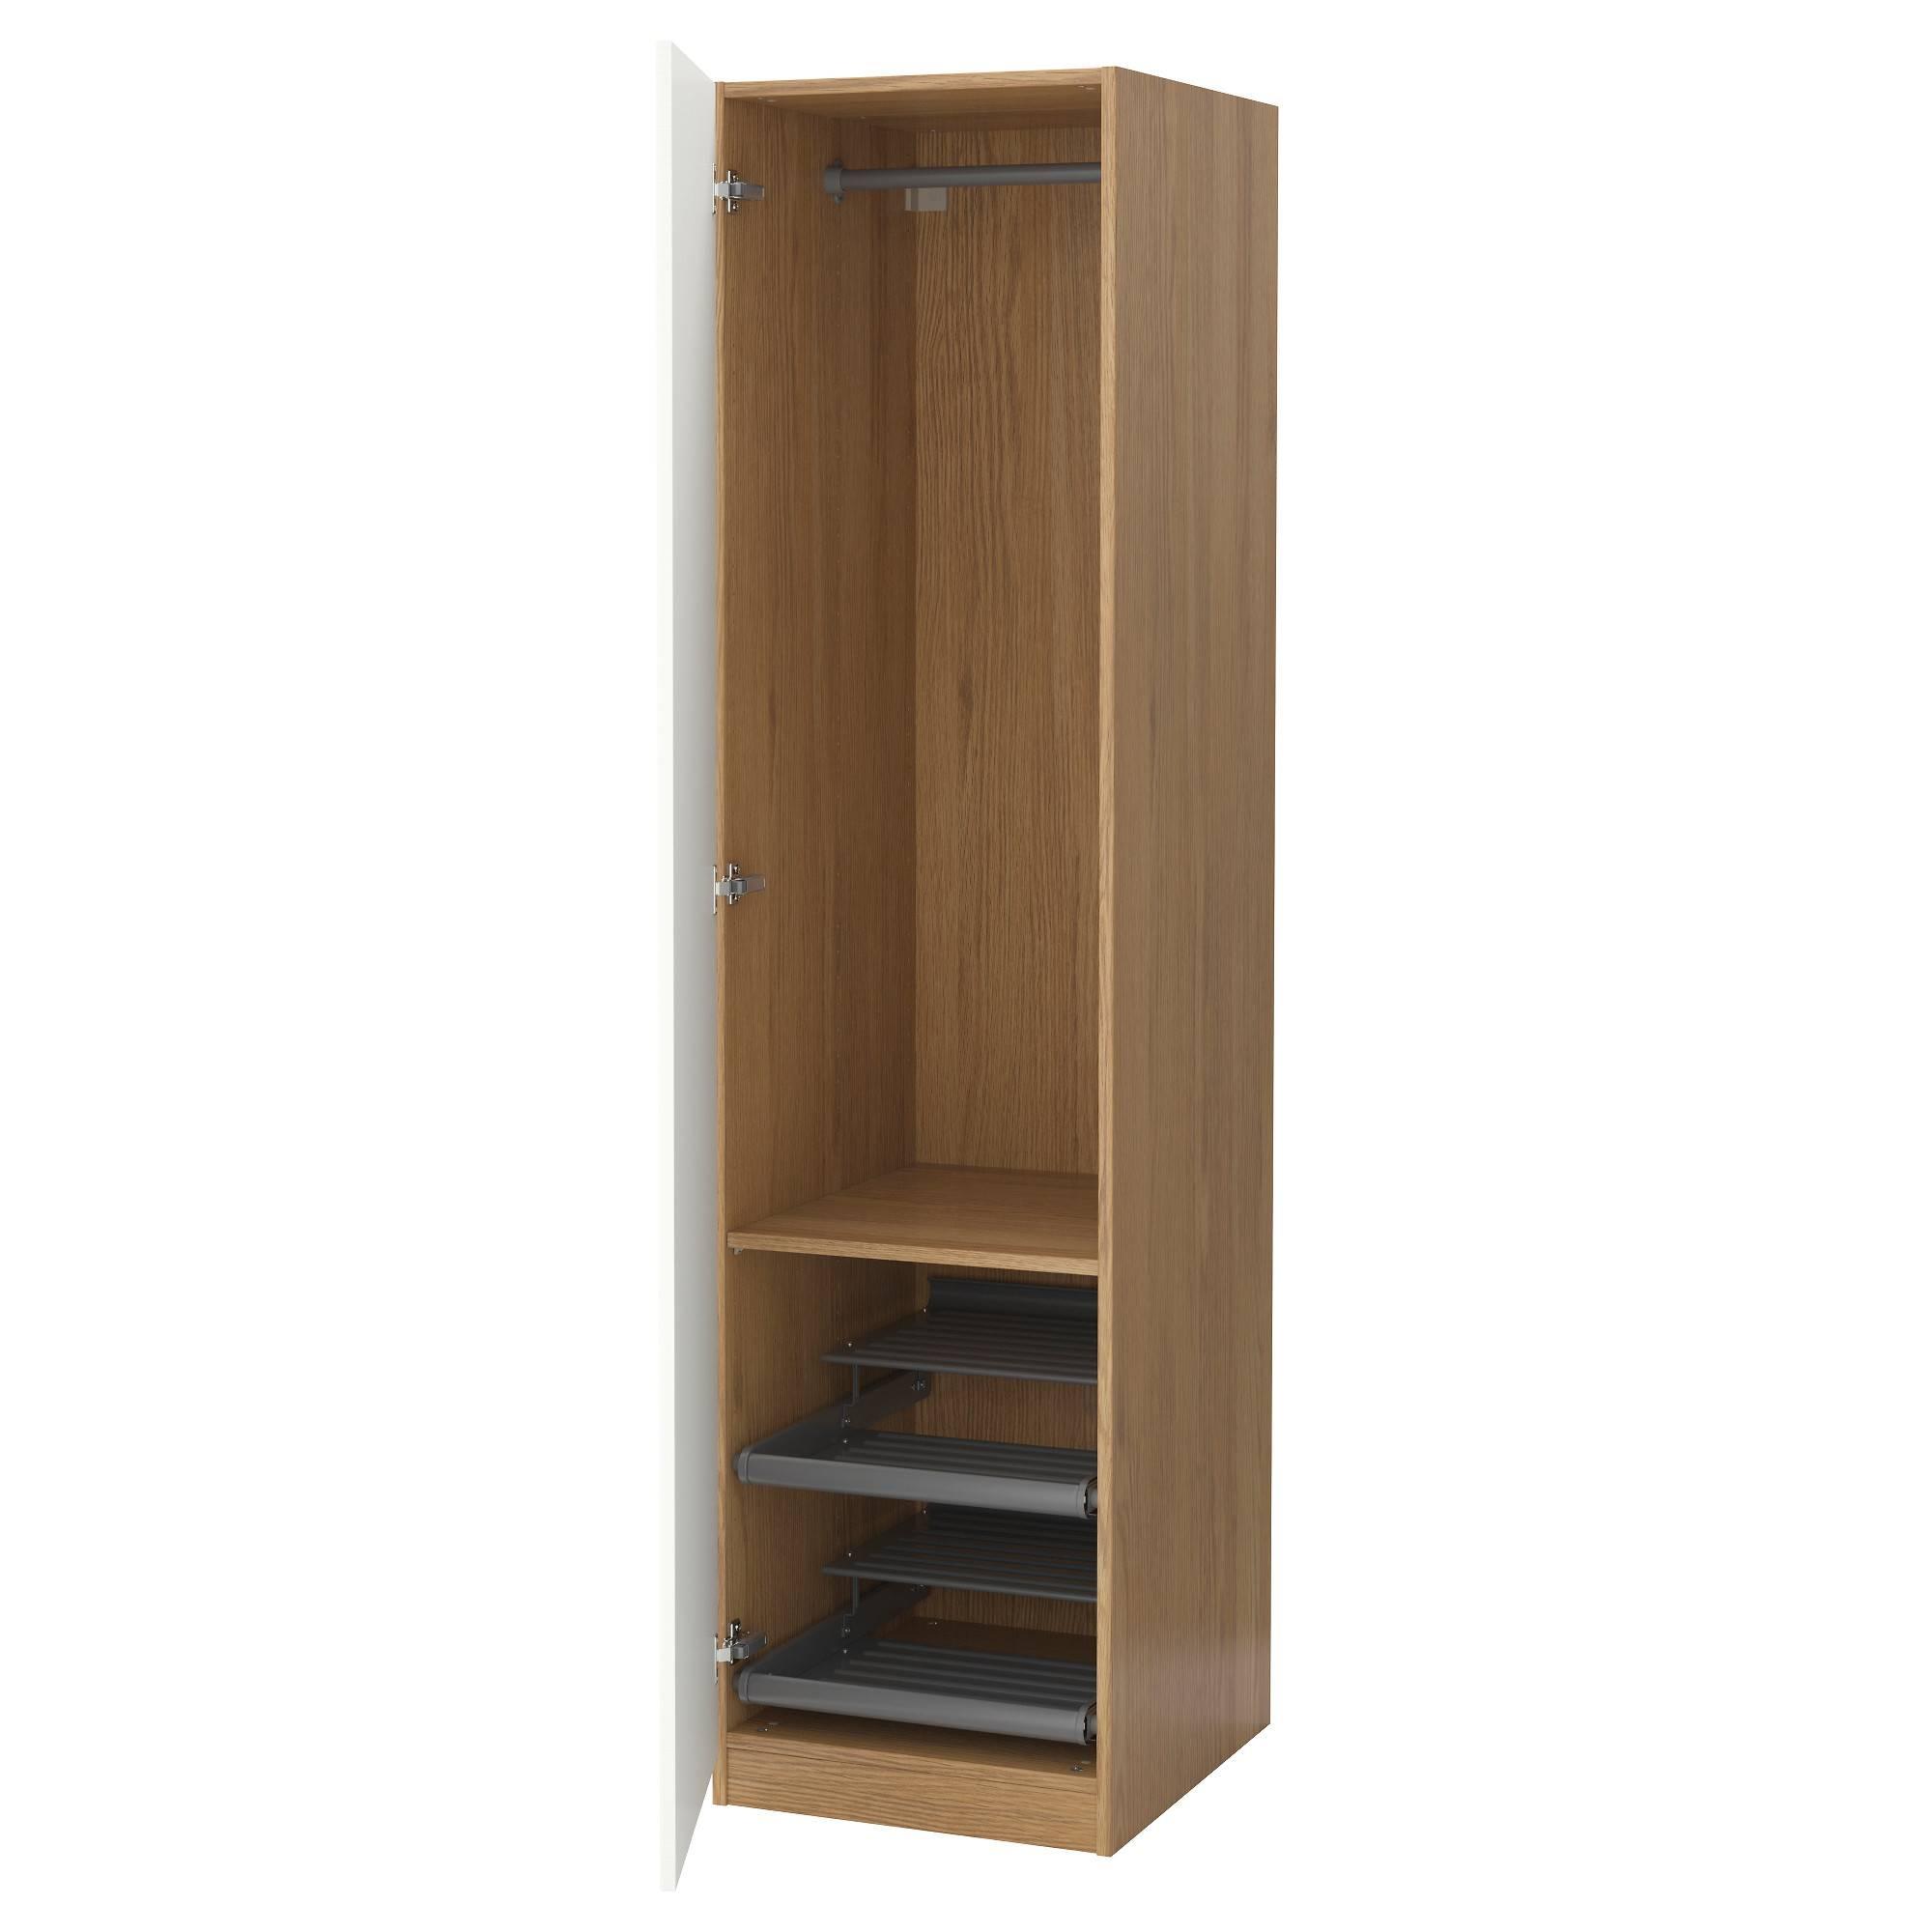 Pax Wardrobe Oak Effect/vinterbro White 50X60X201 Cm – Ikea Regarding Single Wardrobes (View 4 of 15)